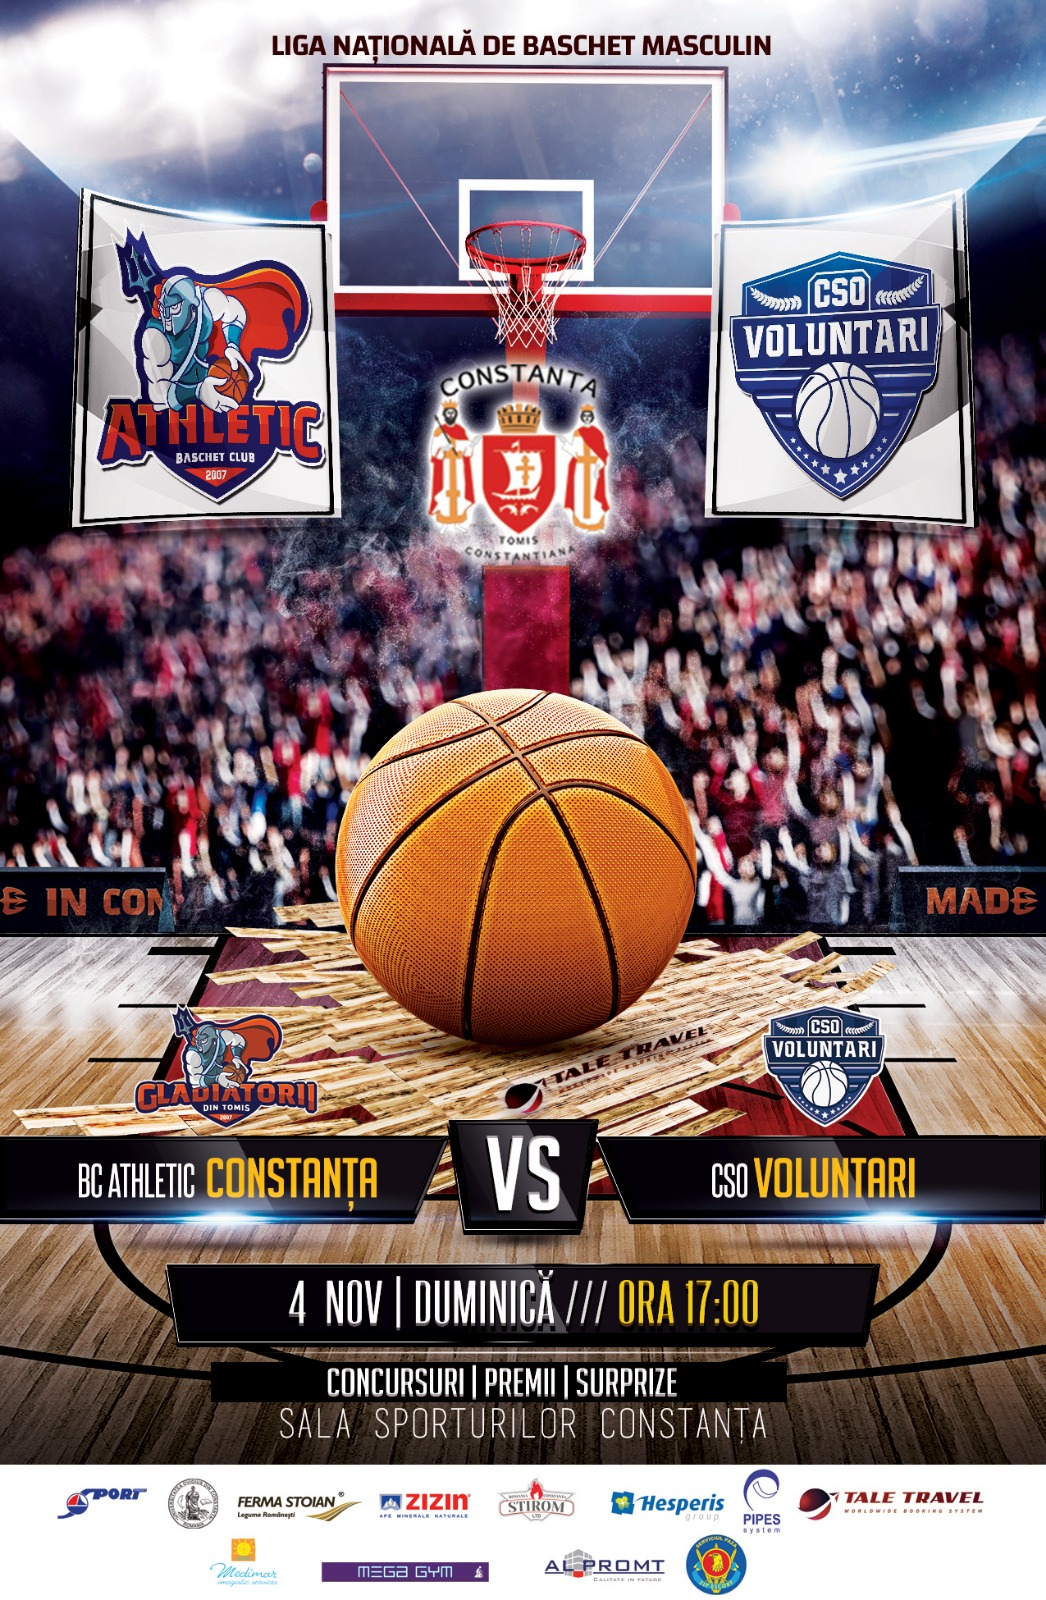 afiș meci baschet masculin BC Athletic Constanța vs. CSO Voluntari 04.11.2018